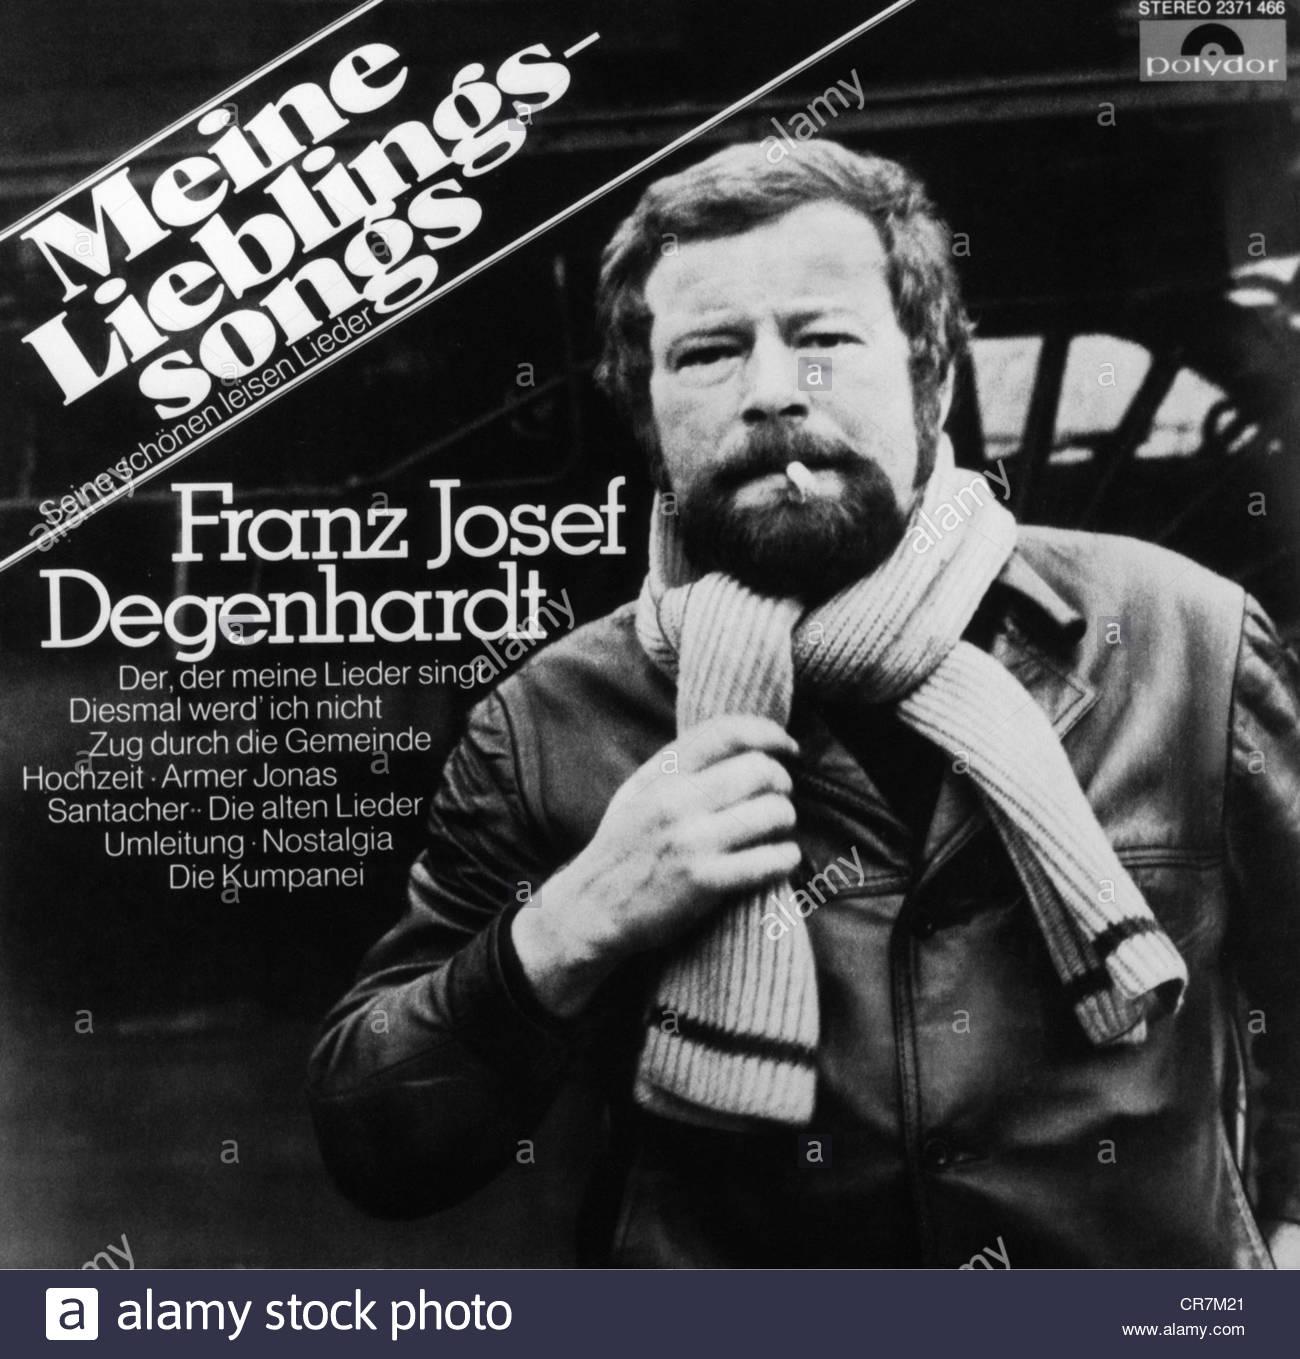 Degenhardt, Francesco Giuseppe, 3. 12.1931 - 14.11.2011, cantautore tedesco, copertina discografica, 'Meine Lieblingssongs' Foto Stock